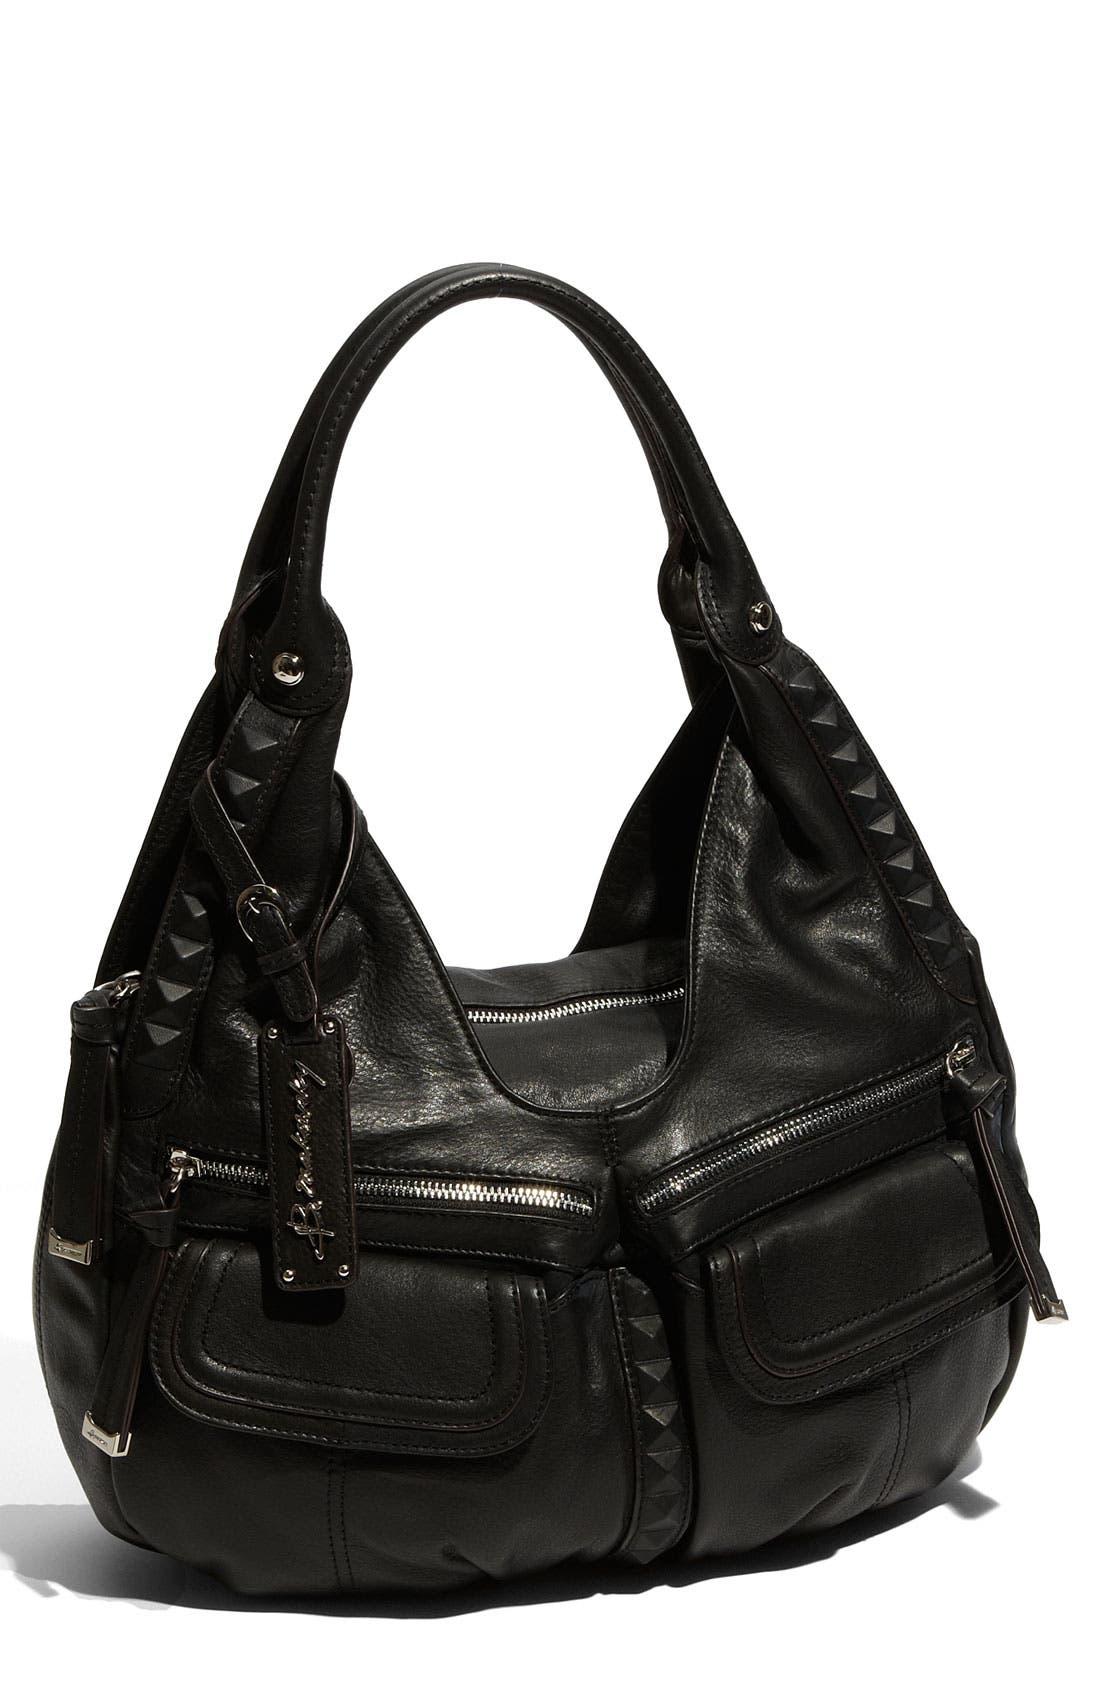 Main Image - B. Makowsky 'Stanton' Leather Satchel